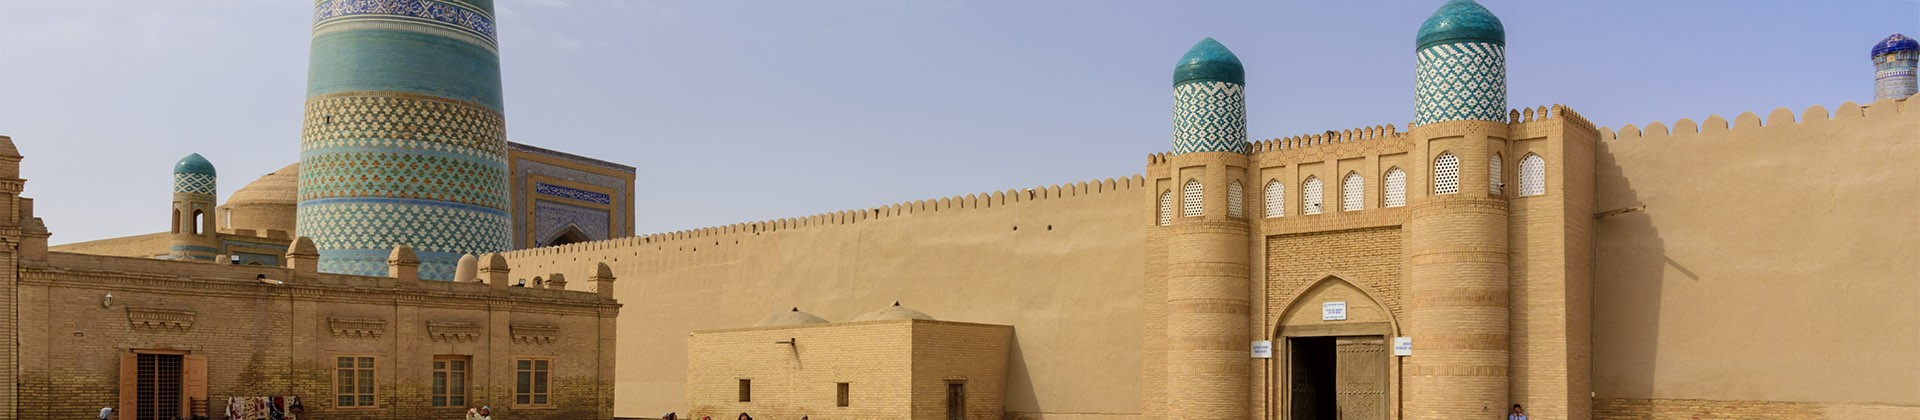 Kunya-Ark Fortress - 1